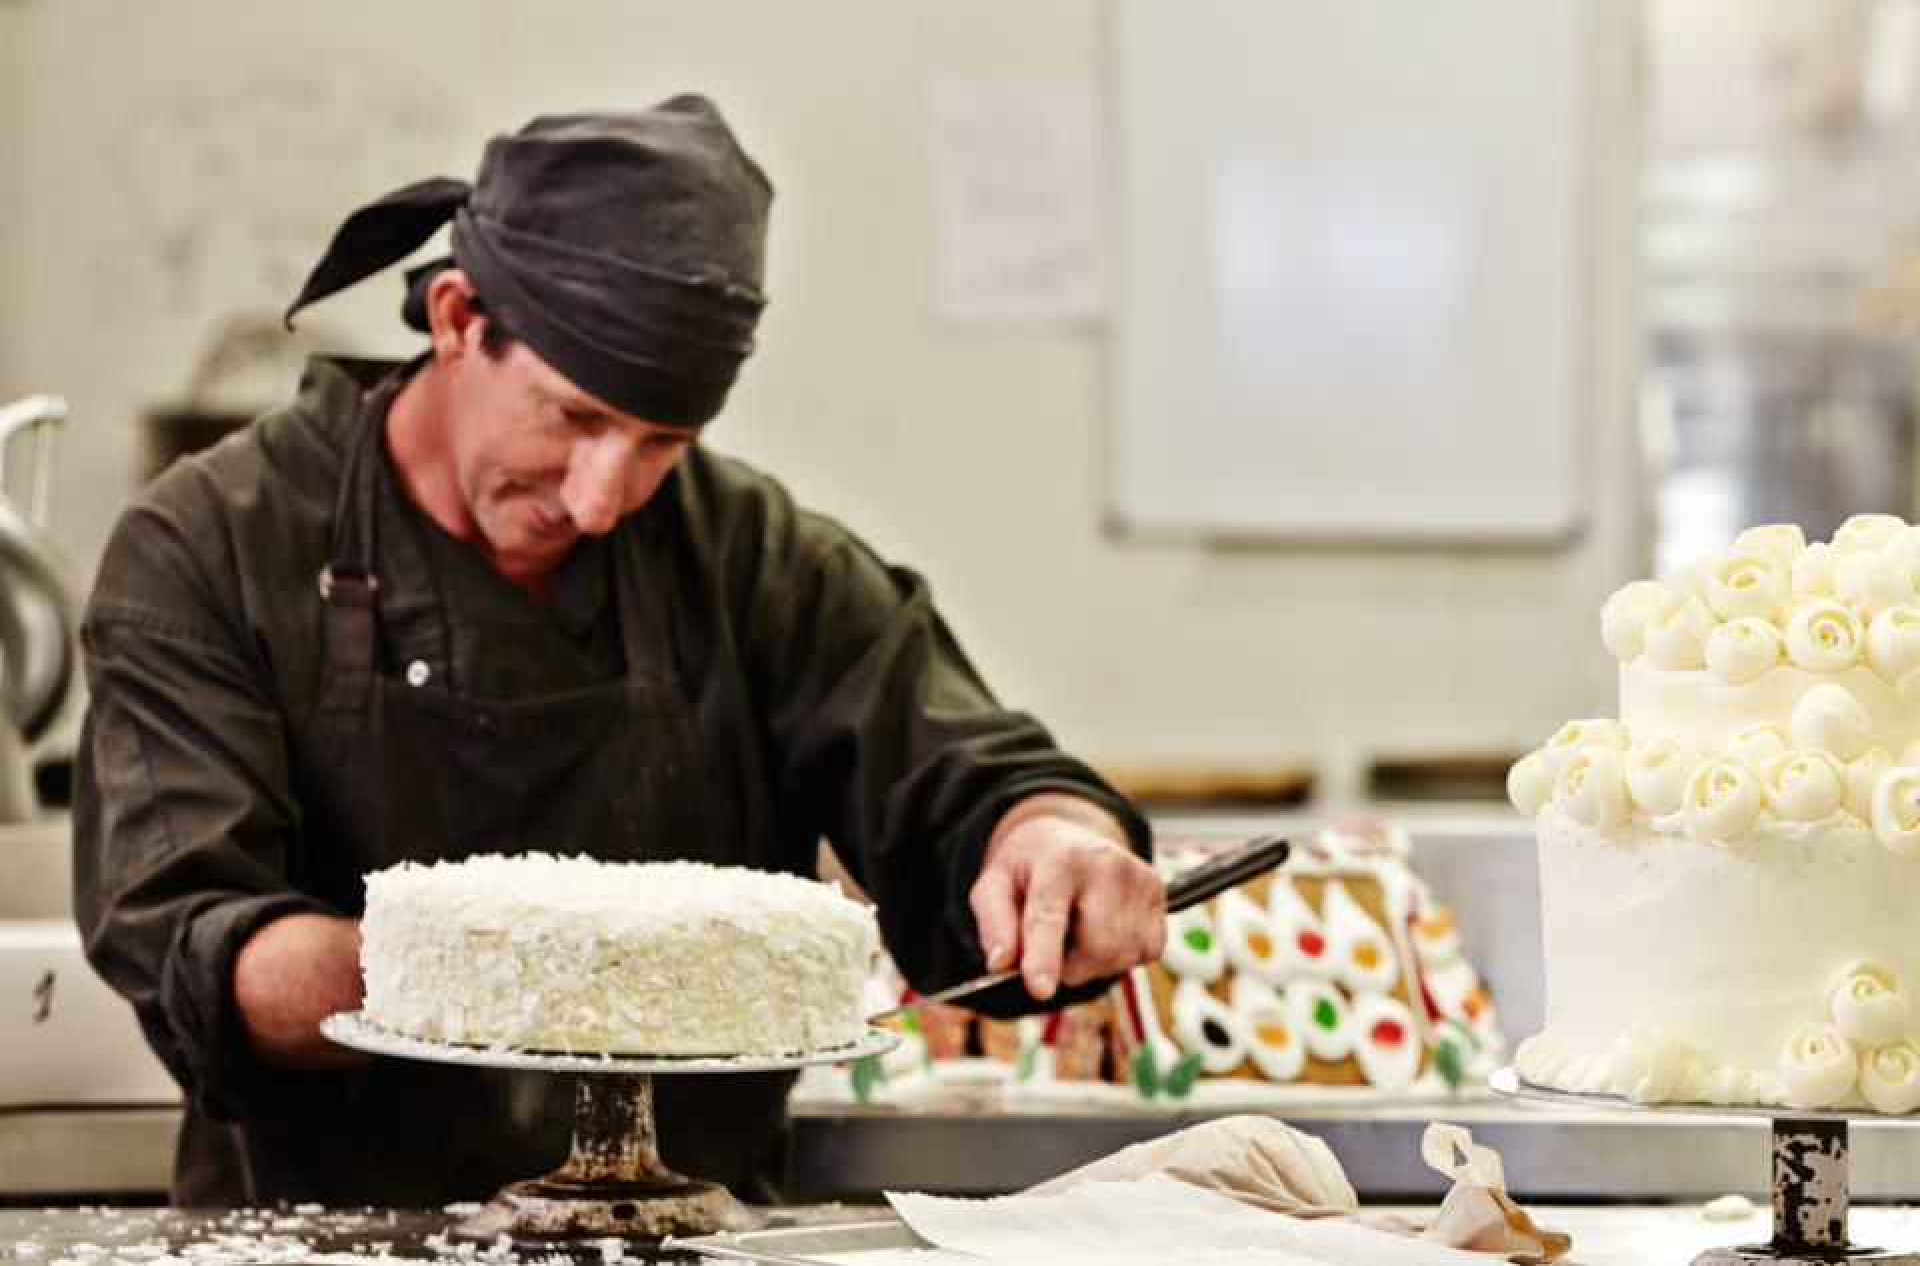 Snows artisan bakers 12